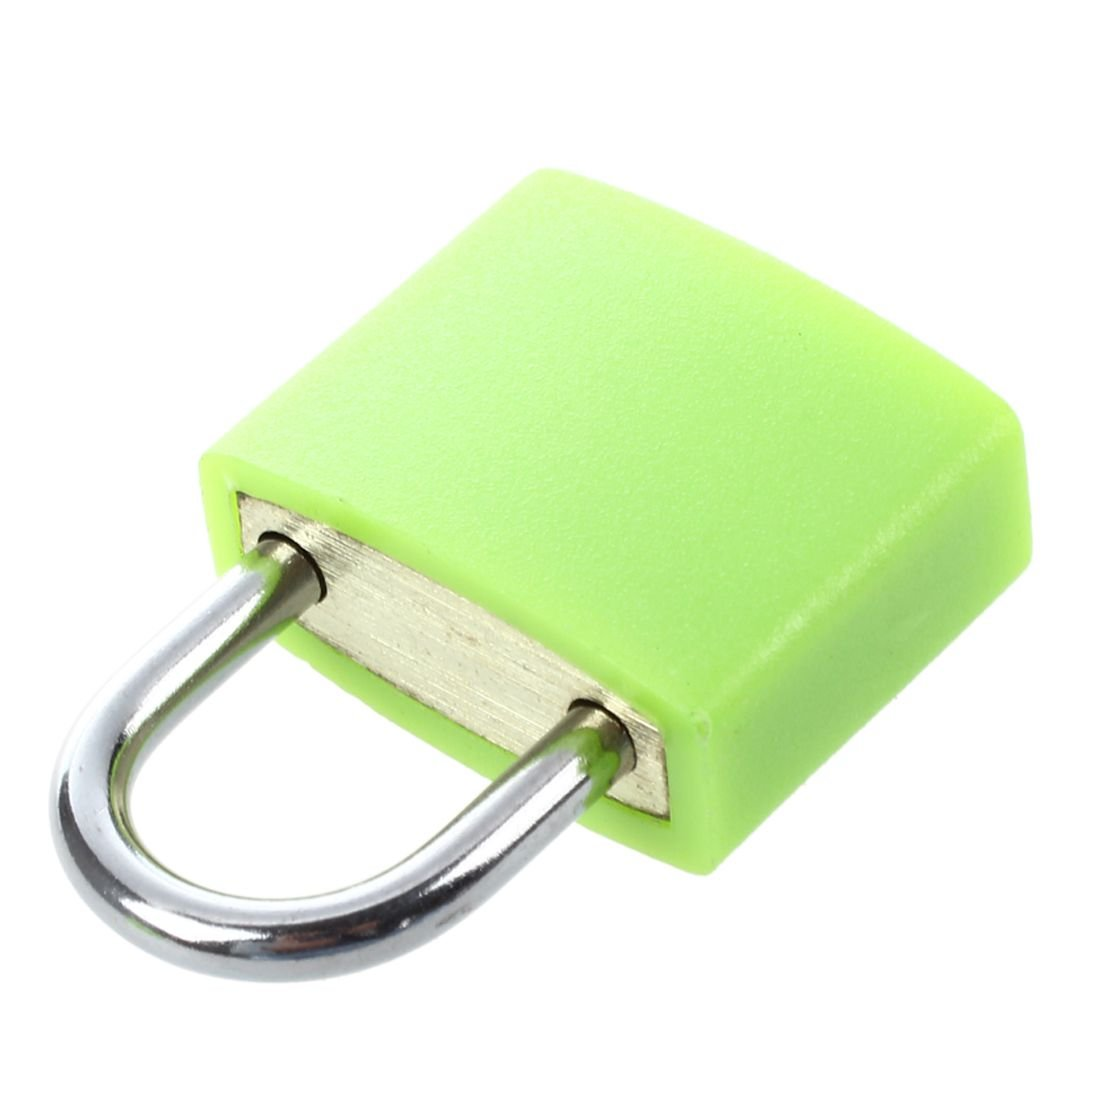 REFURBISHHOUSE Rectangle tiroirs Valise Boite a outils cadenas vert 23mm avec 2 Cles